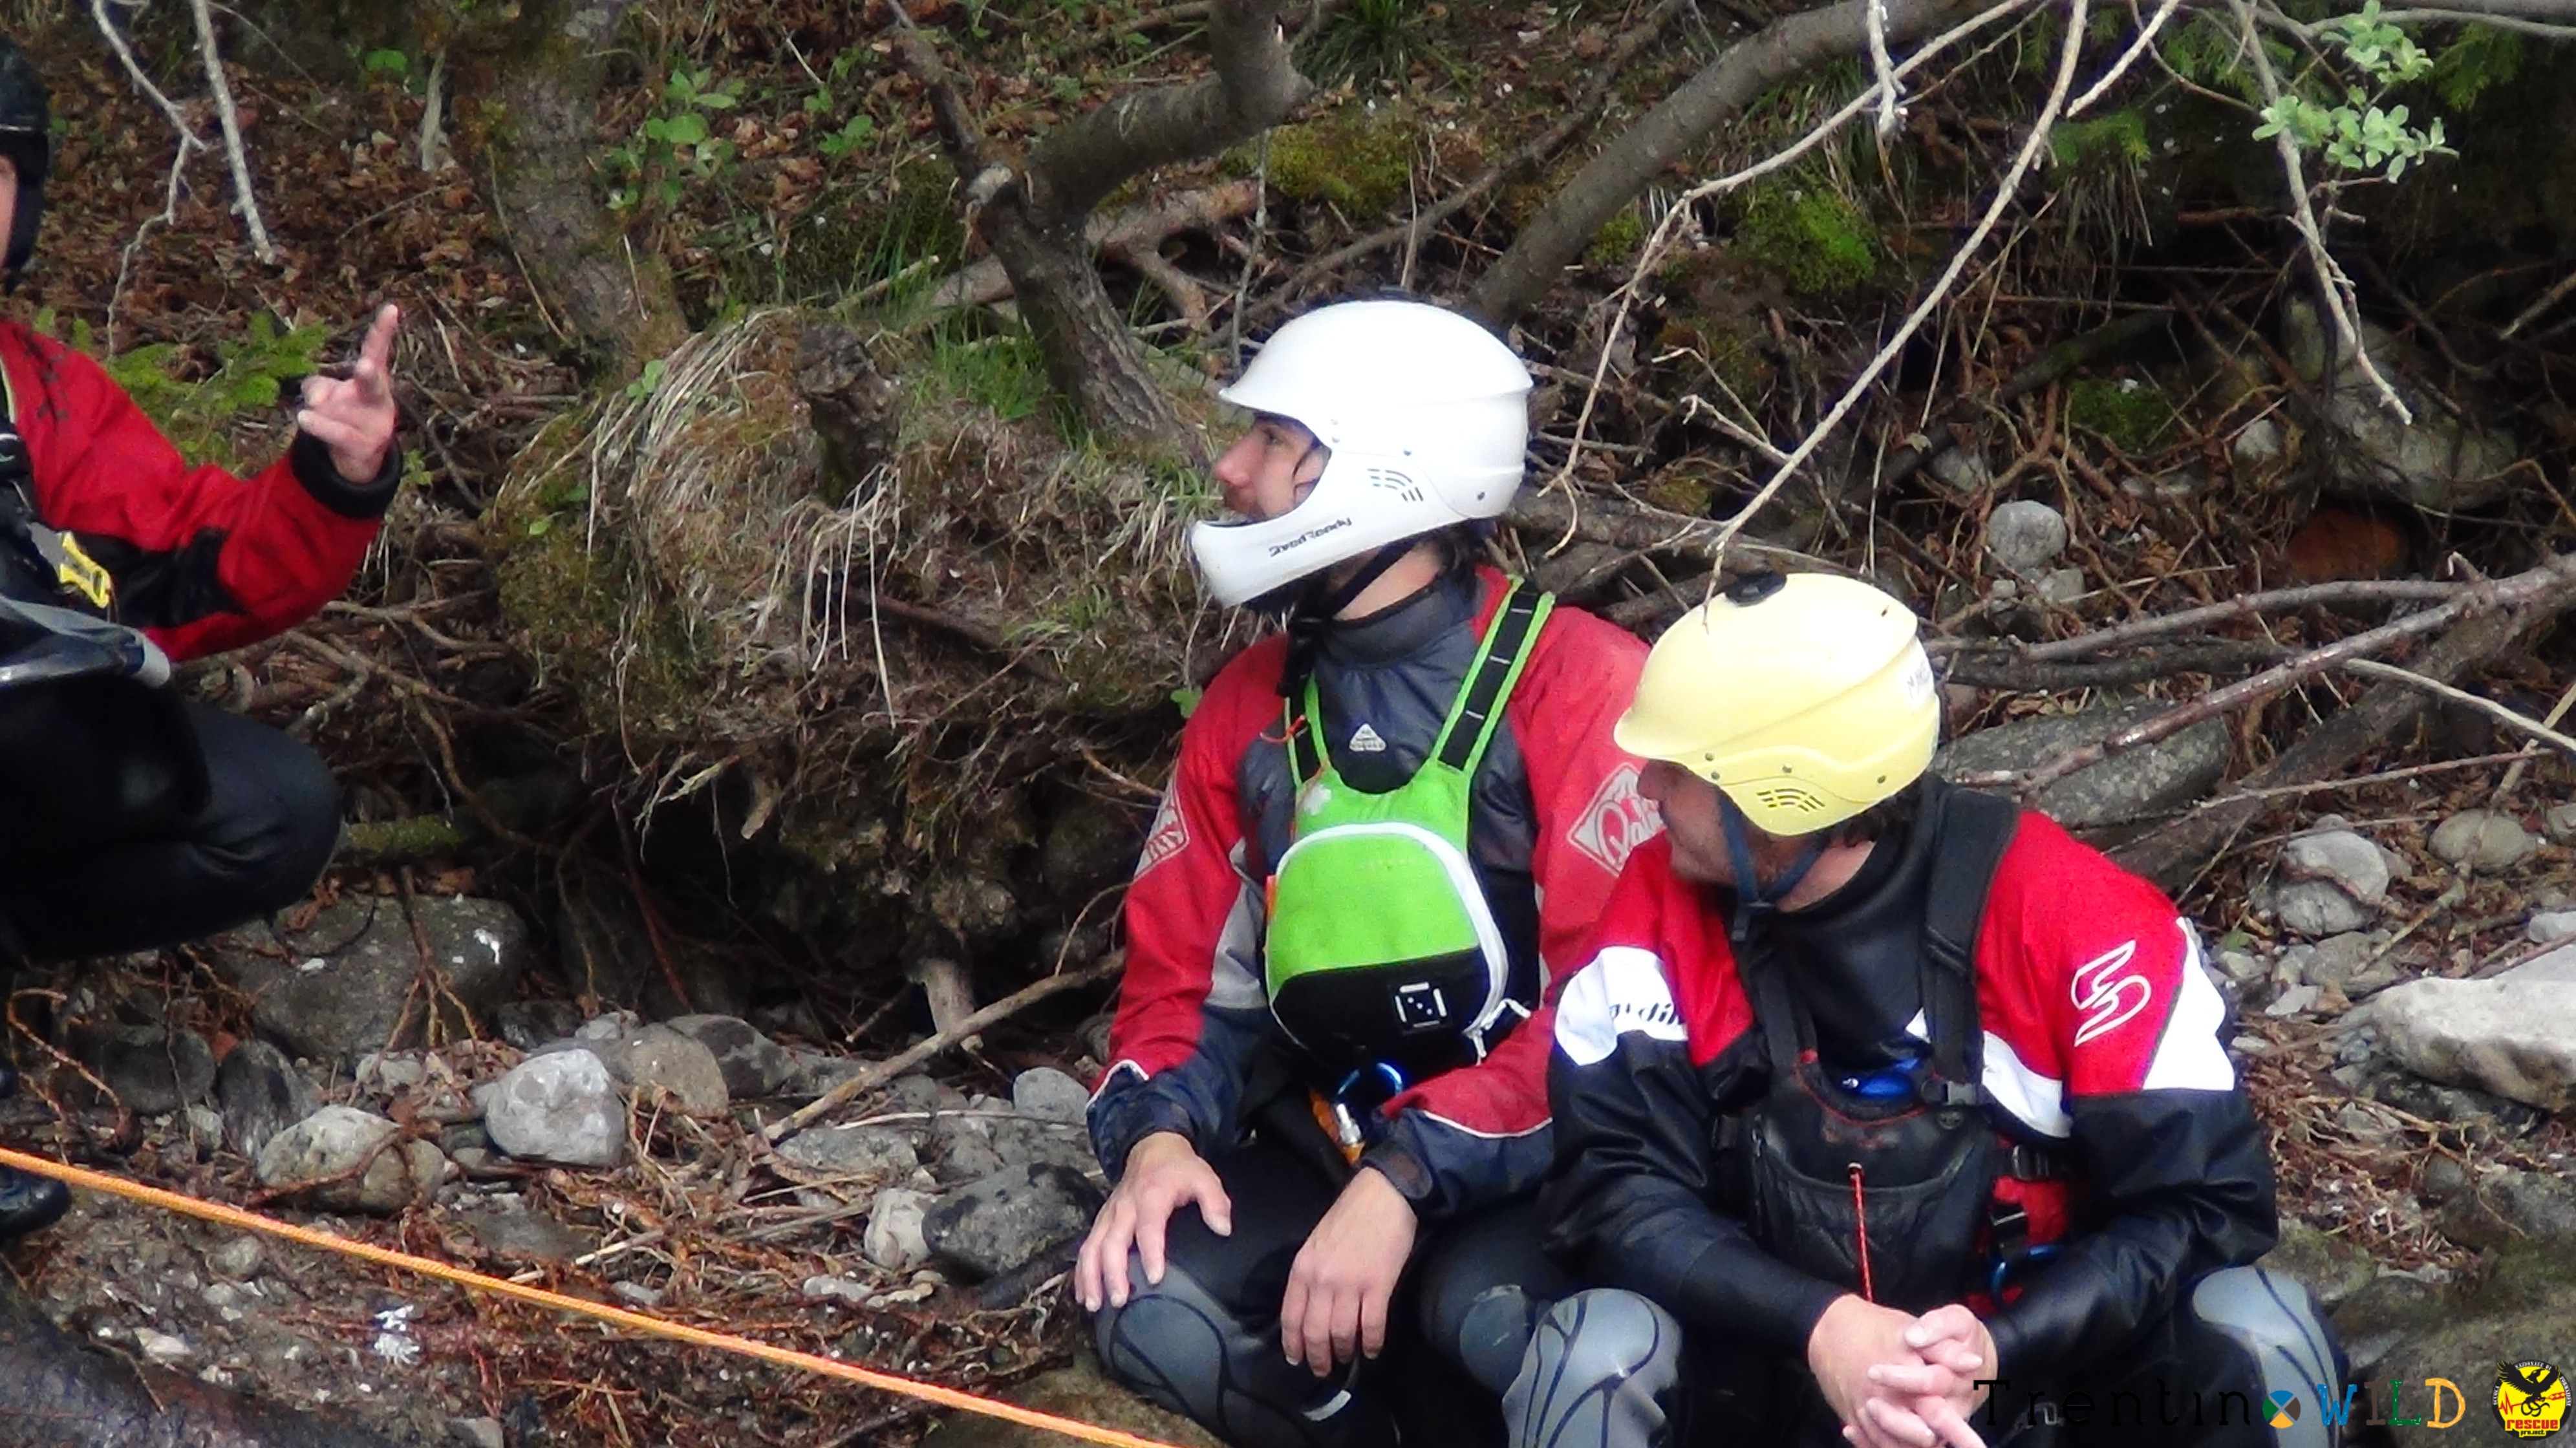 soccorso-fluviale-kayakDSC06973_tn